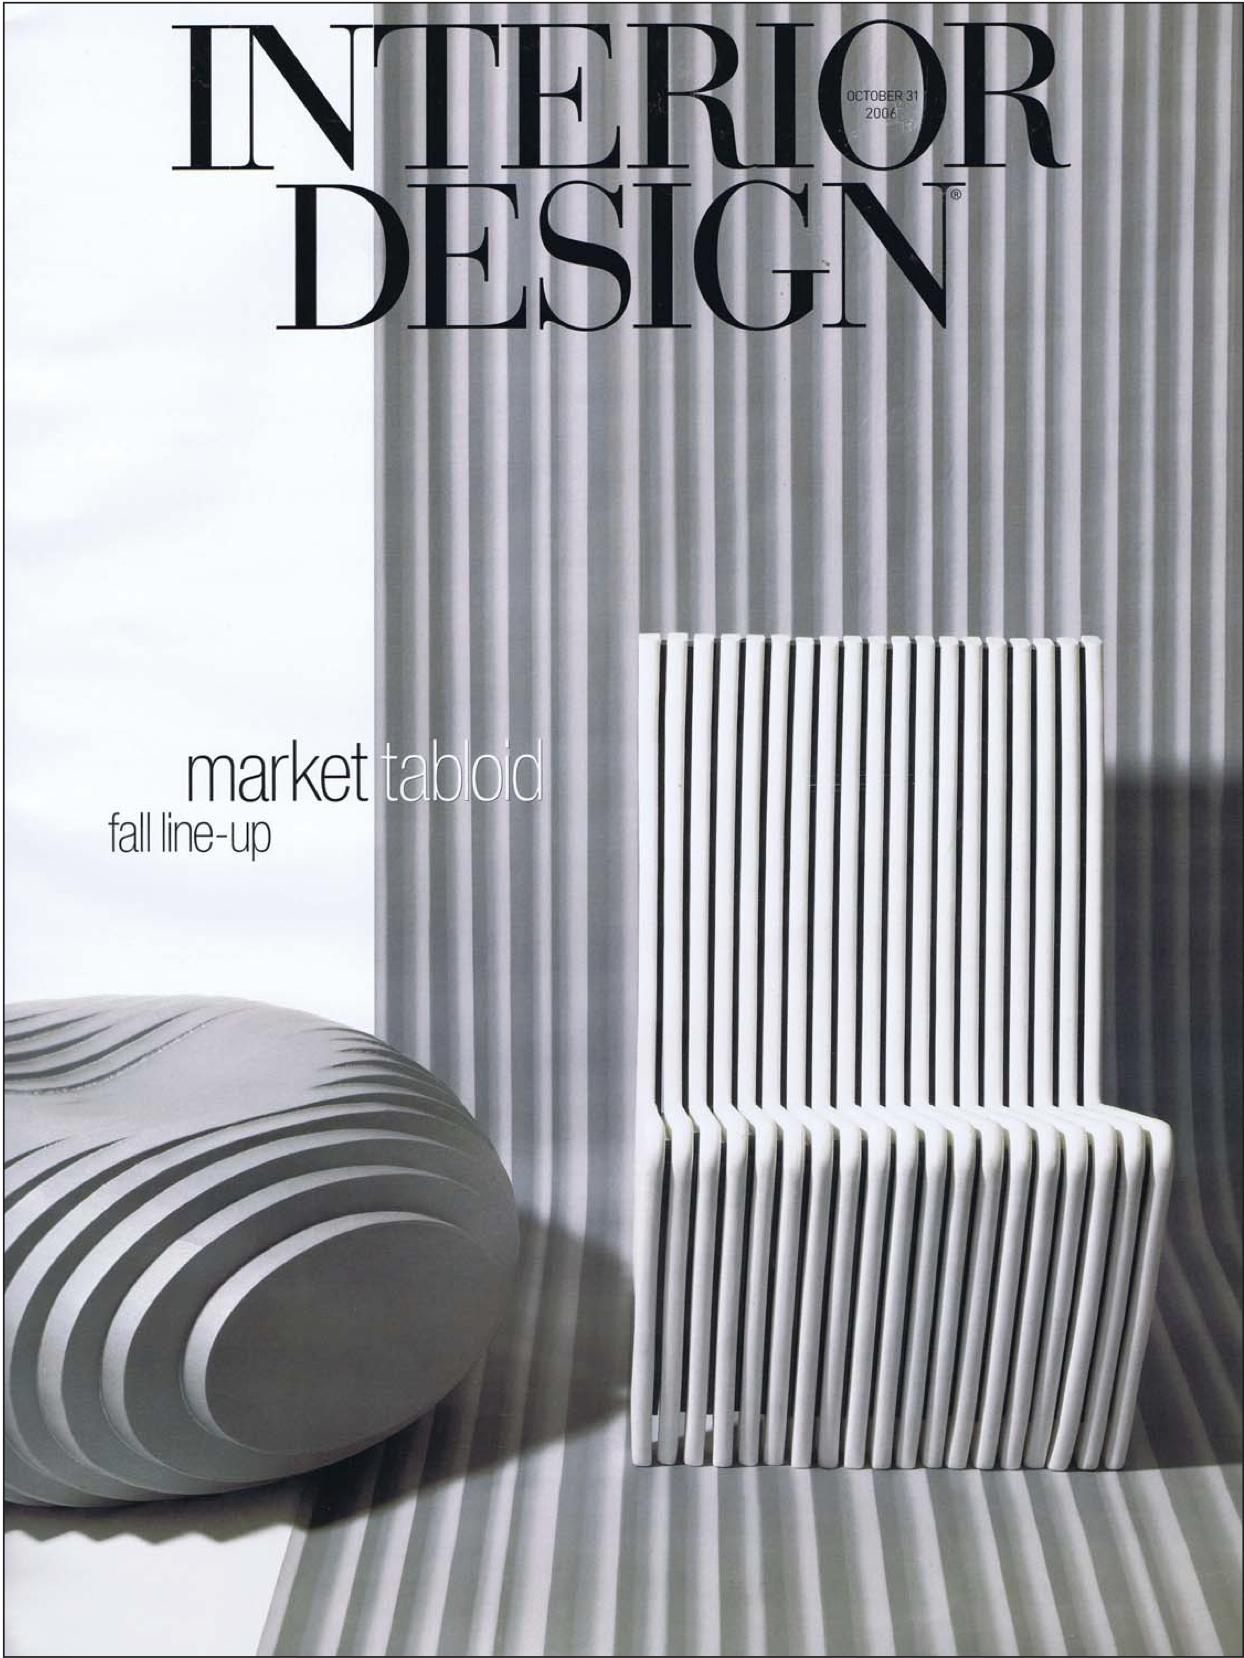 reeta-gyamlani-farrago-design-interior-design-magazine-3